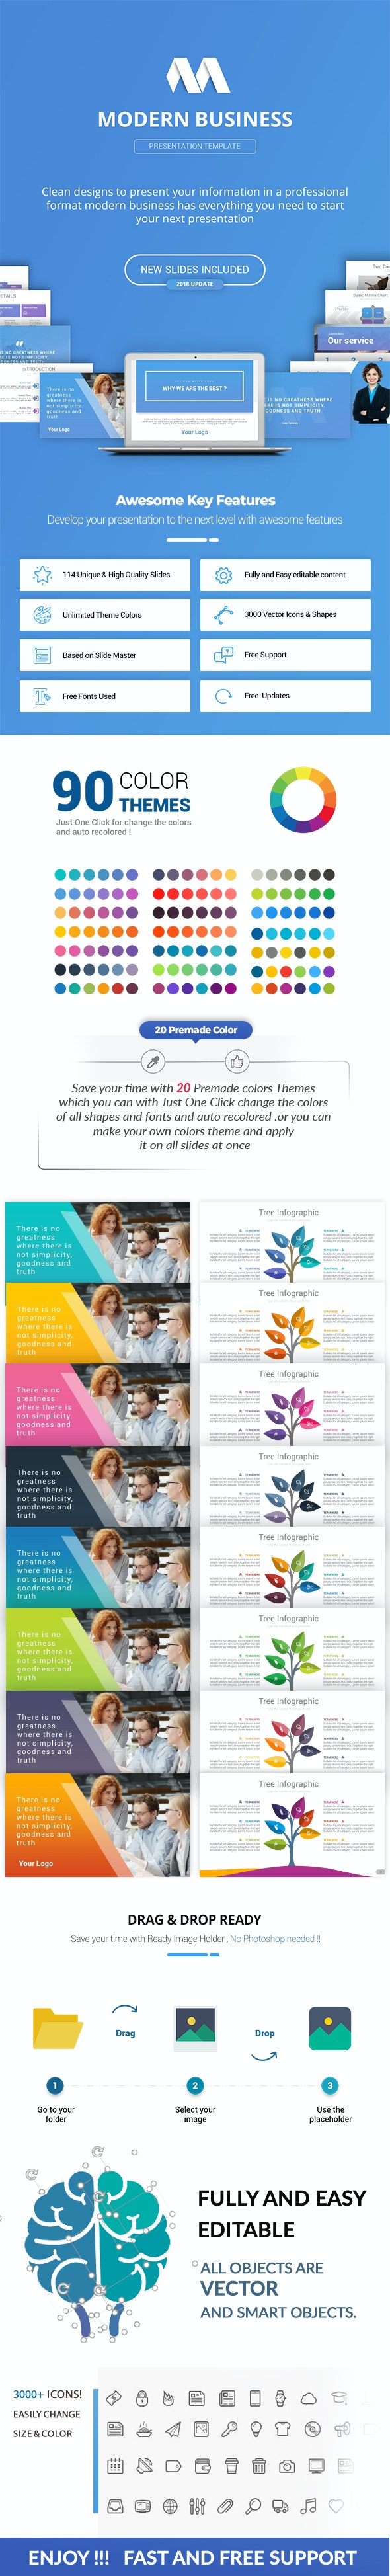 Modern Business PowerPoint Presentation Template - Business PowerPoint Templates